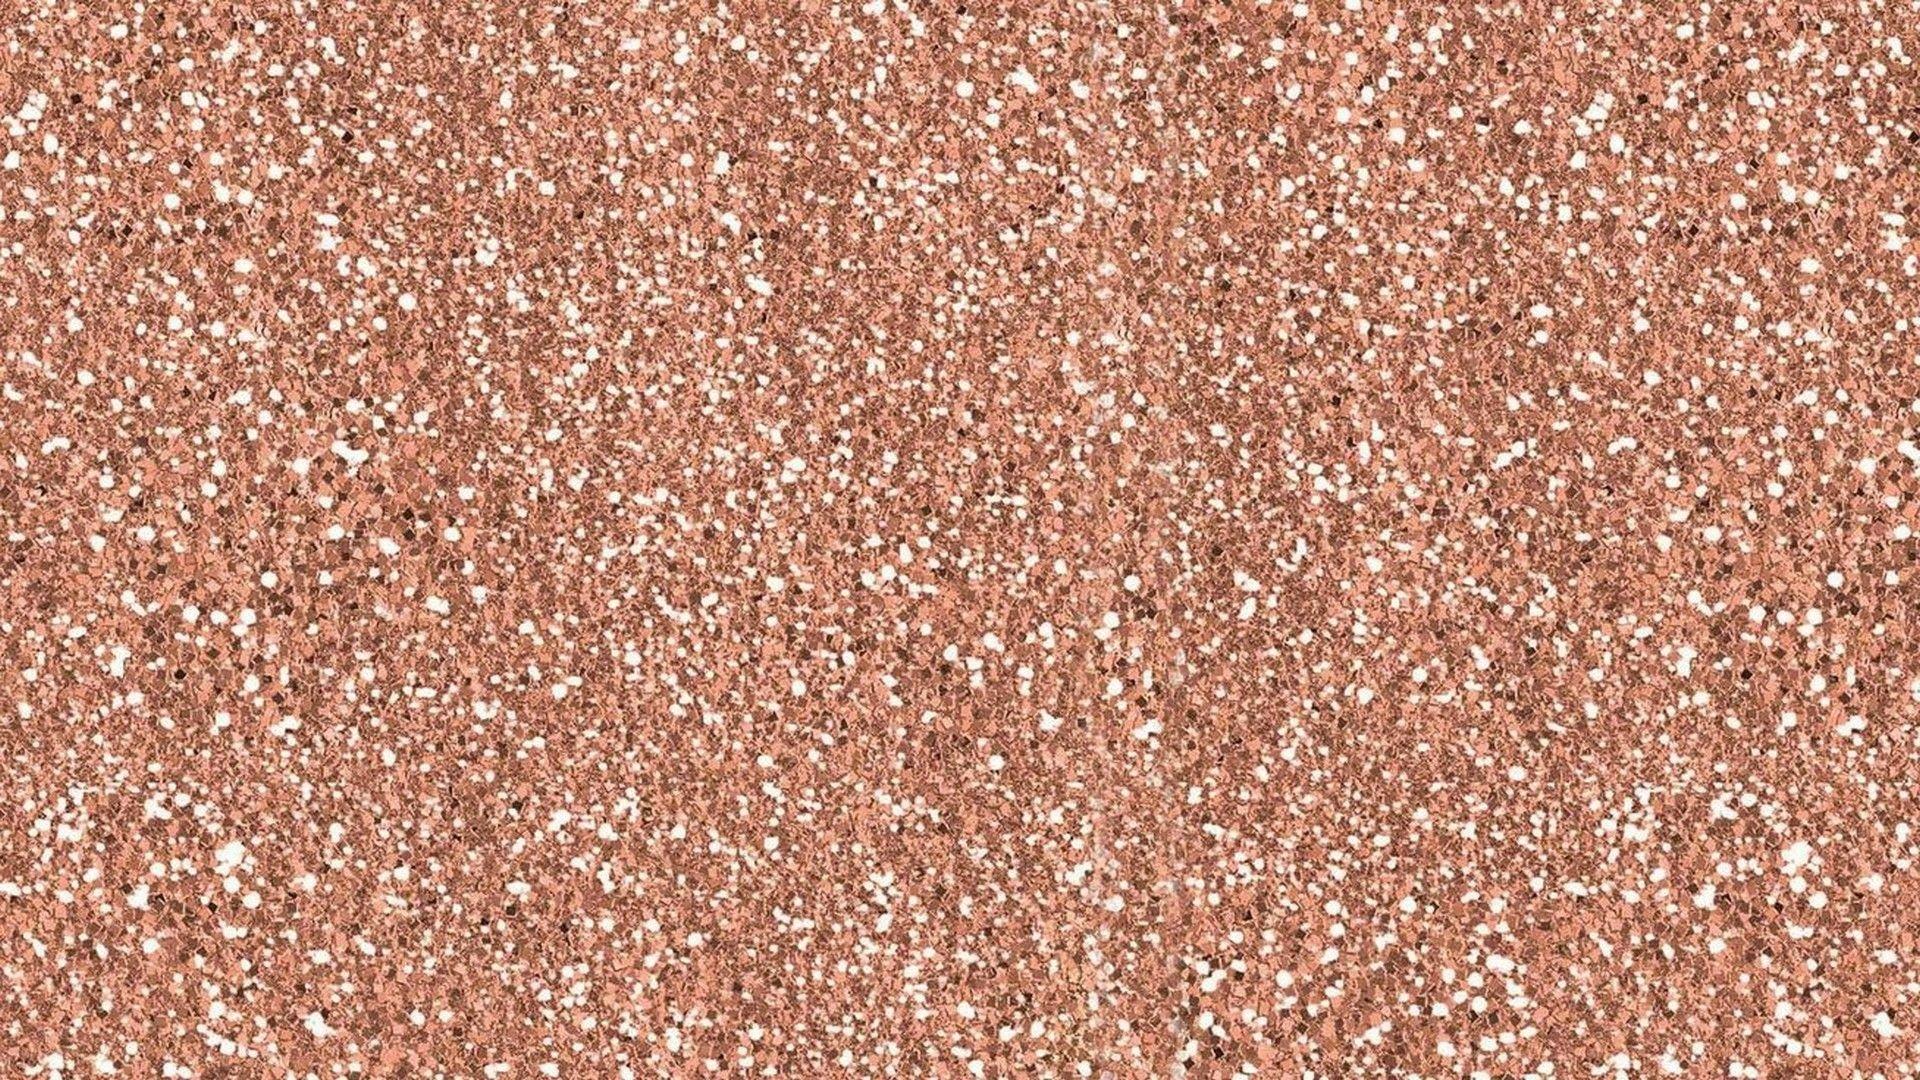 Res: 1920x1080, Rose Gold Glitter Desktop Backgrounds HD | Best HD Wallpapers